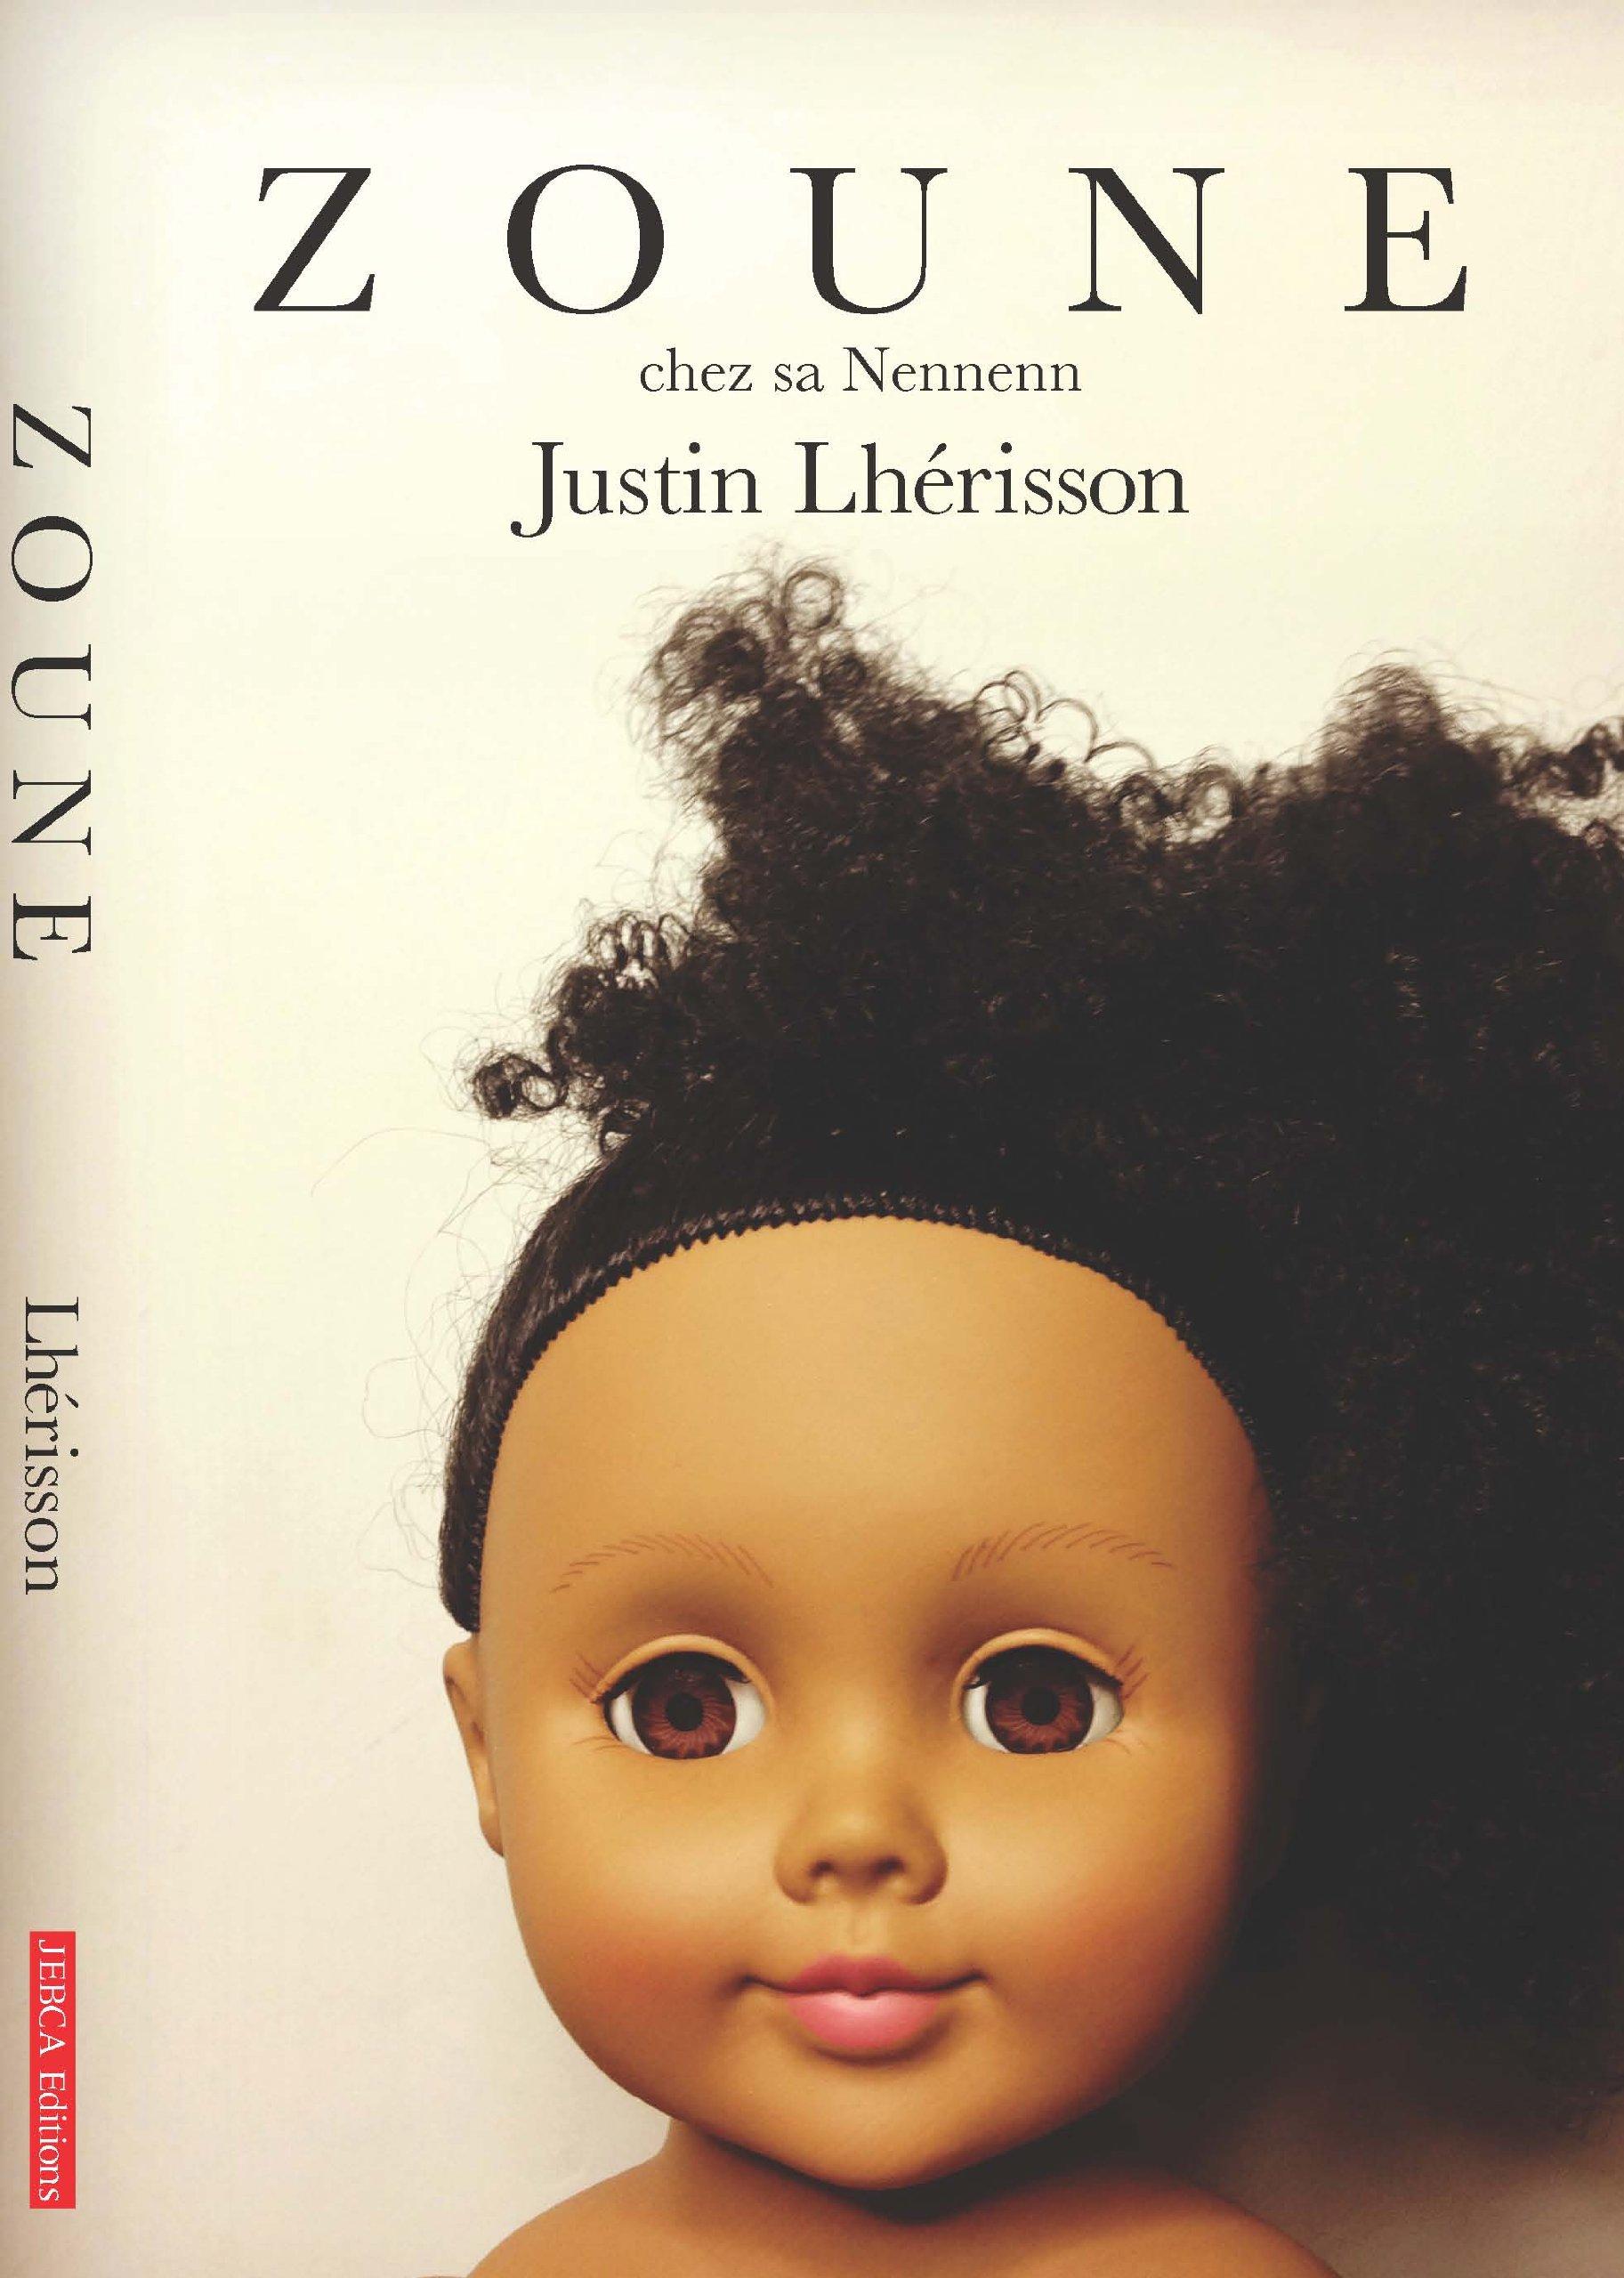 Zoune chez sa Nennenn (French Edition) pdf epub